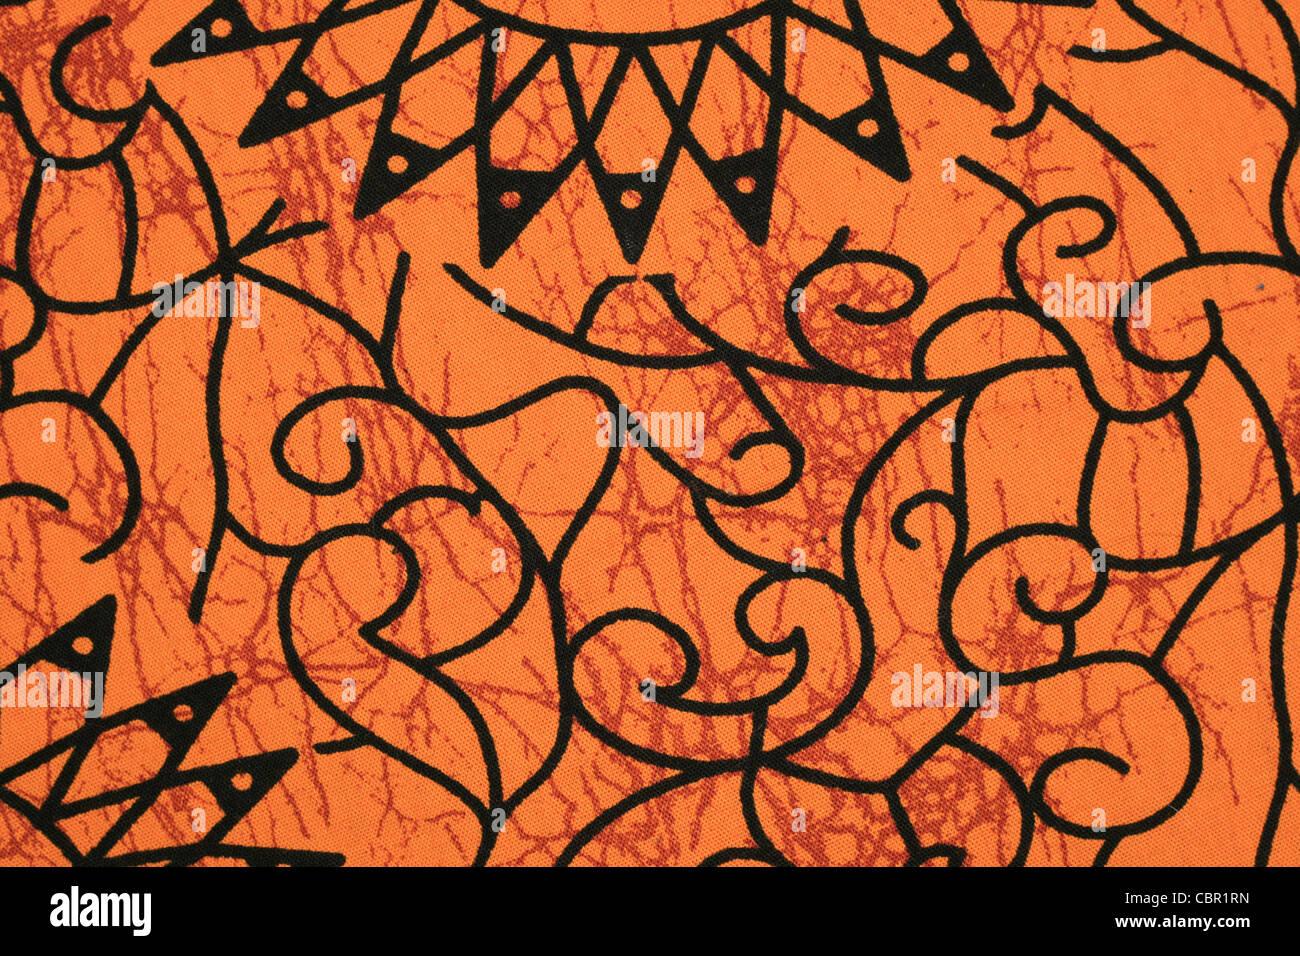 orange and black Tanzanian cloth pattern detail - Stock Image